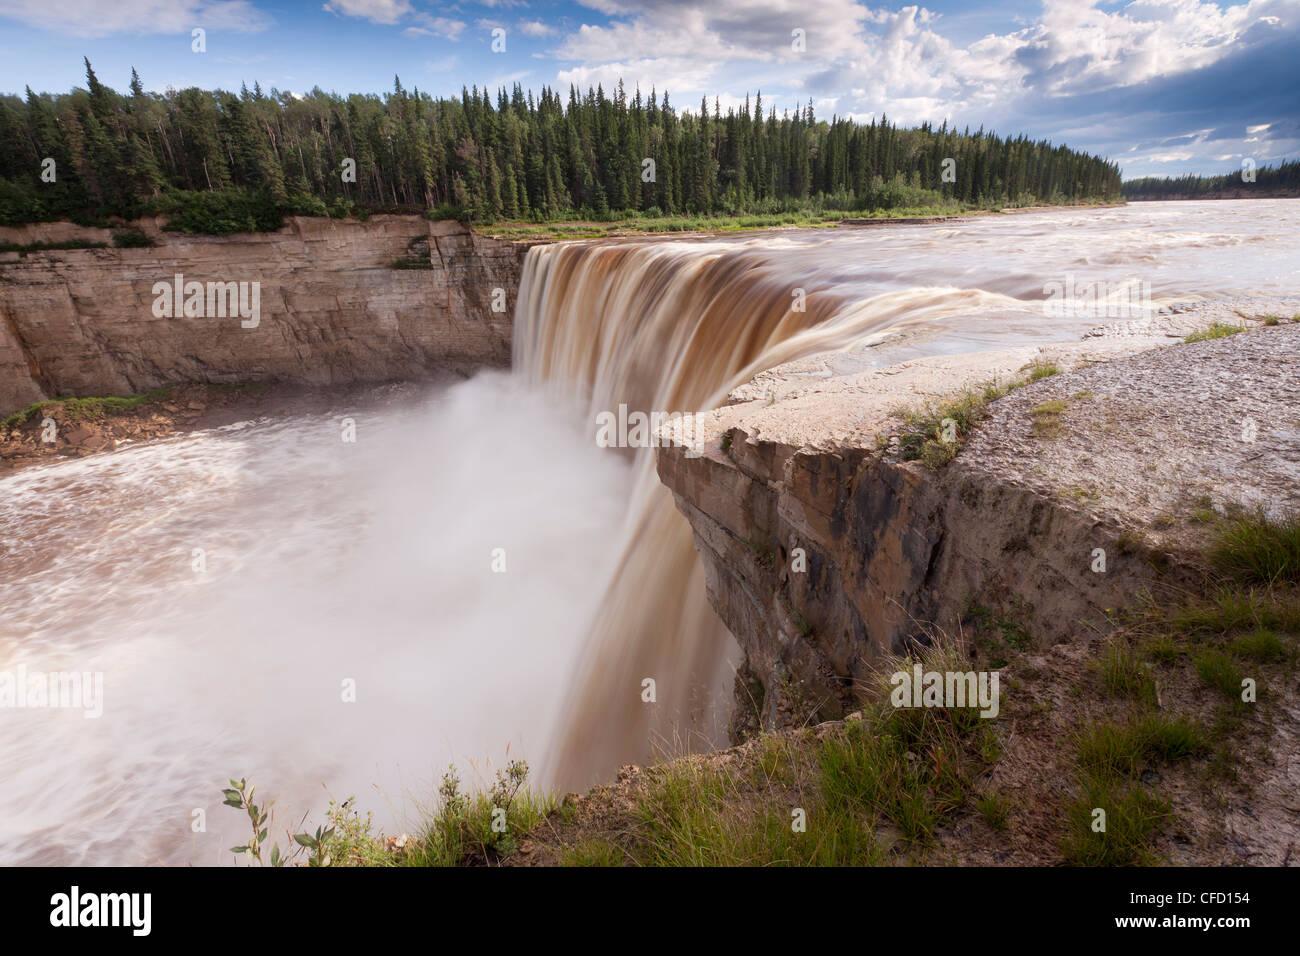 Alexandra Falls, Twin Falls Territorial Park, Northwest Territories, Canada - Stock Image